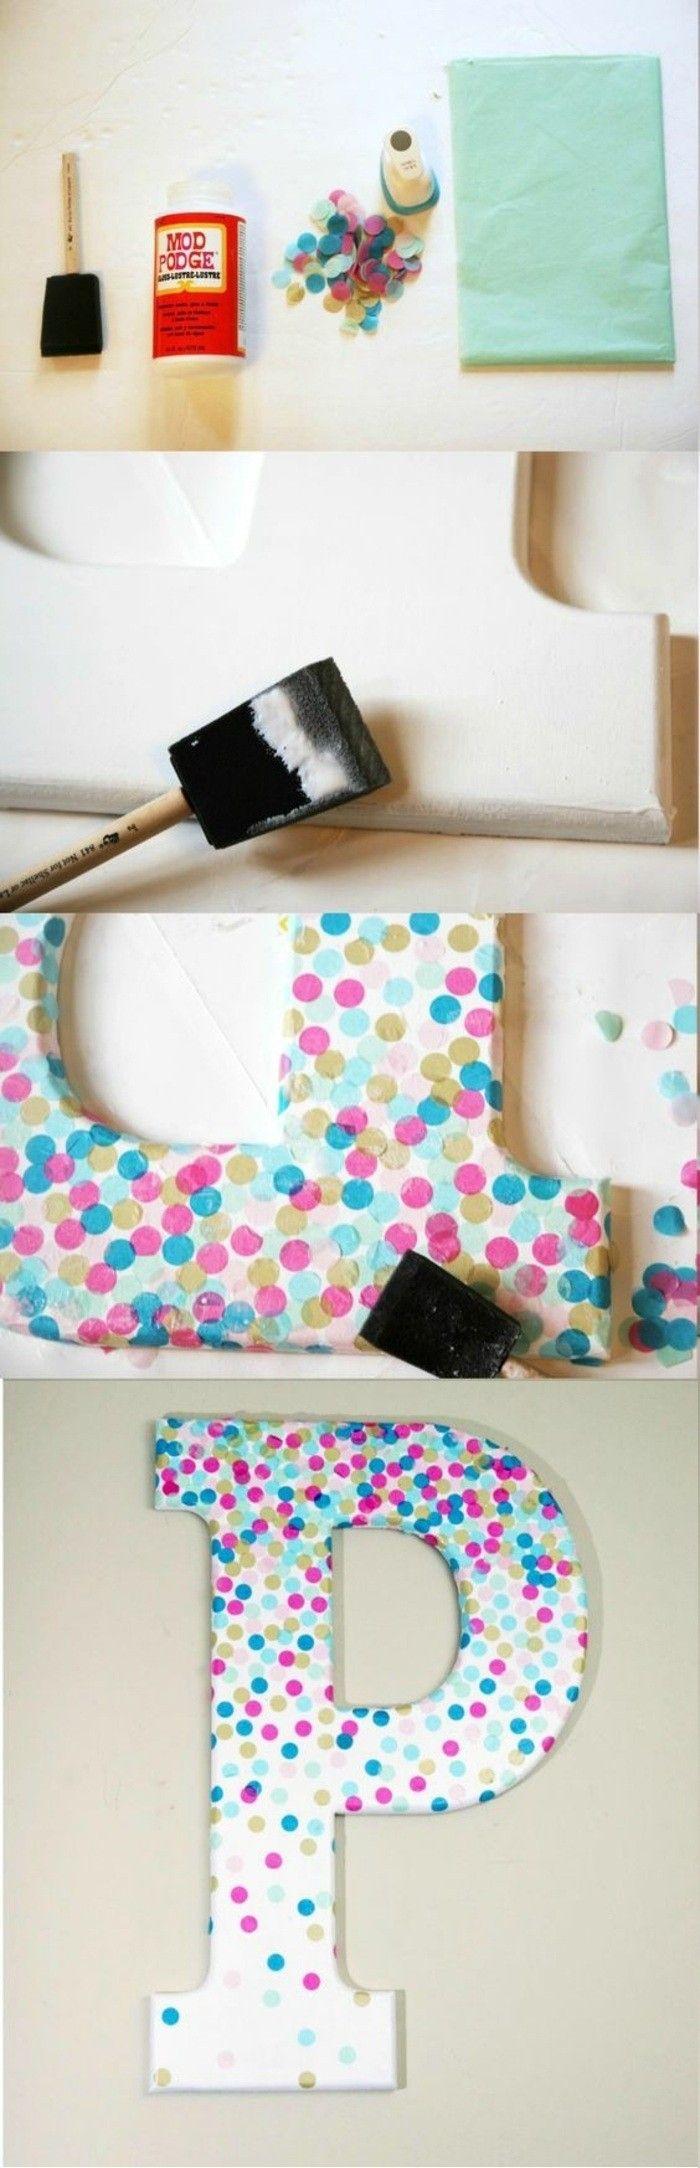 Best 25+ Wanddeko selber machen ideas on Pinterest | Wanddeko ...